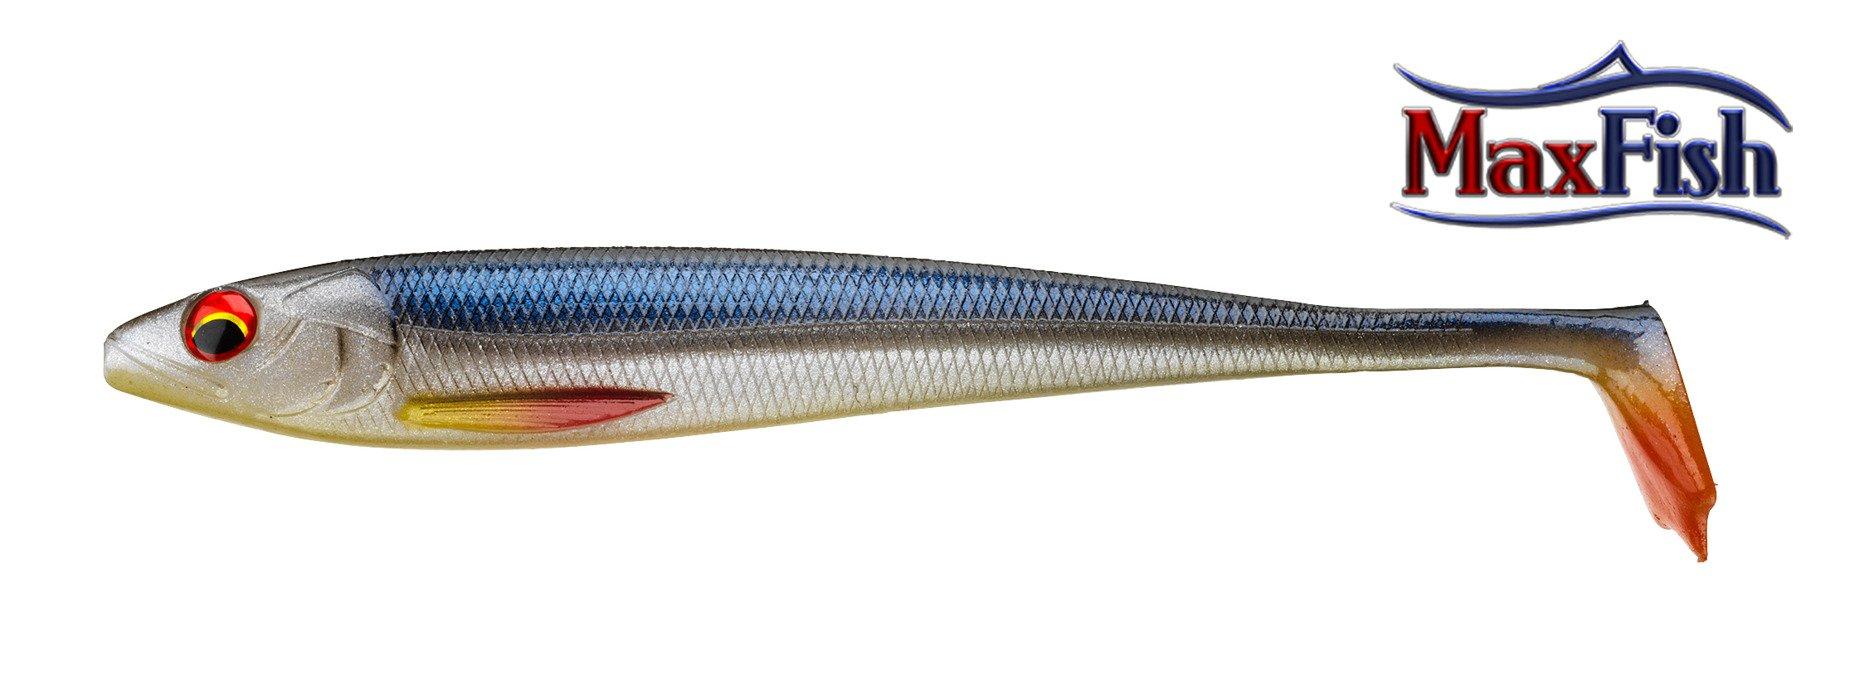 Daiwa Prorex Duckfin Shad XL - 25cm Roach